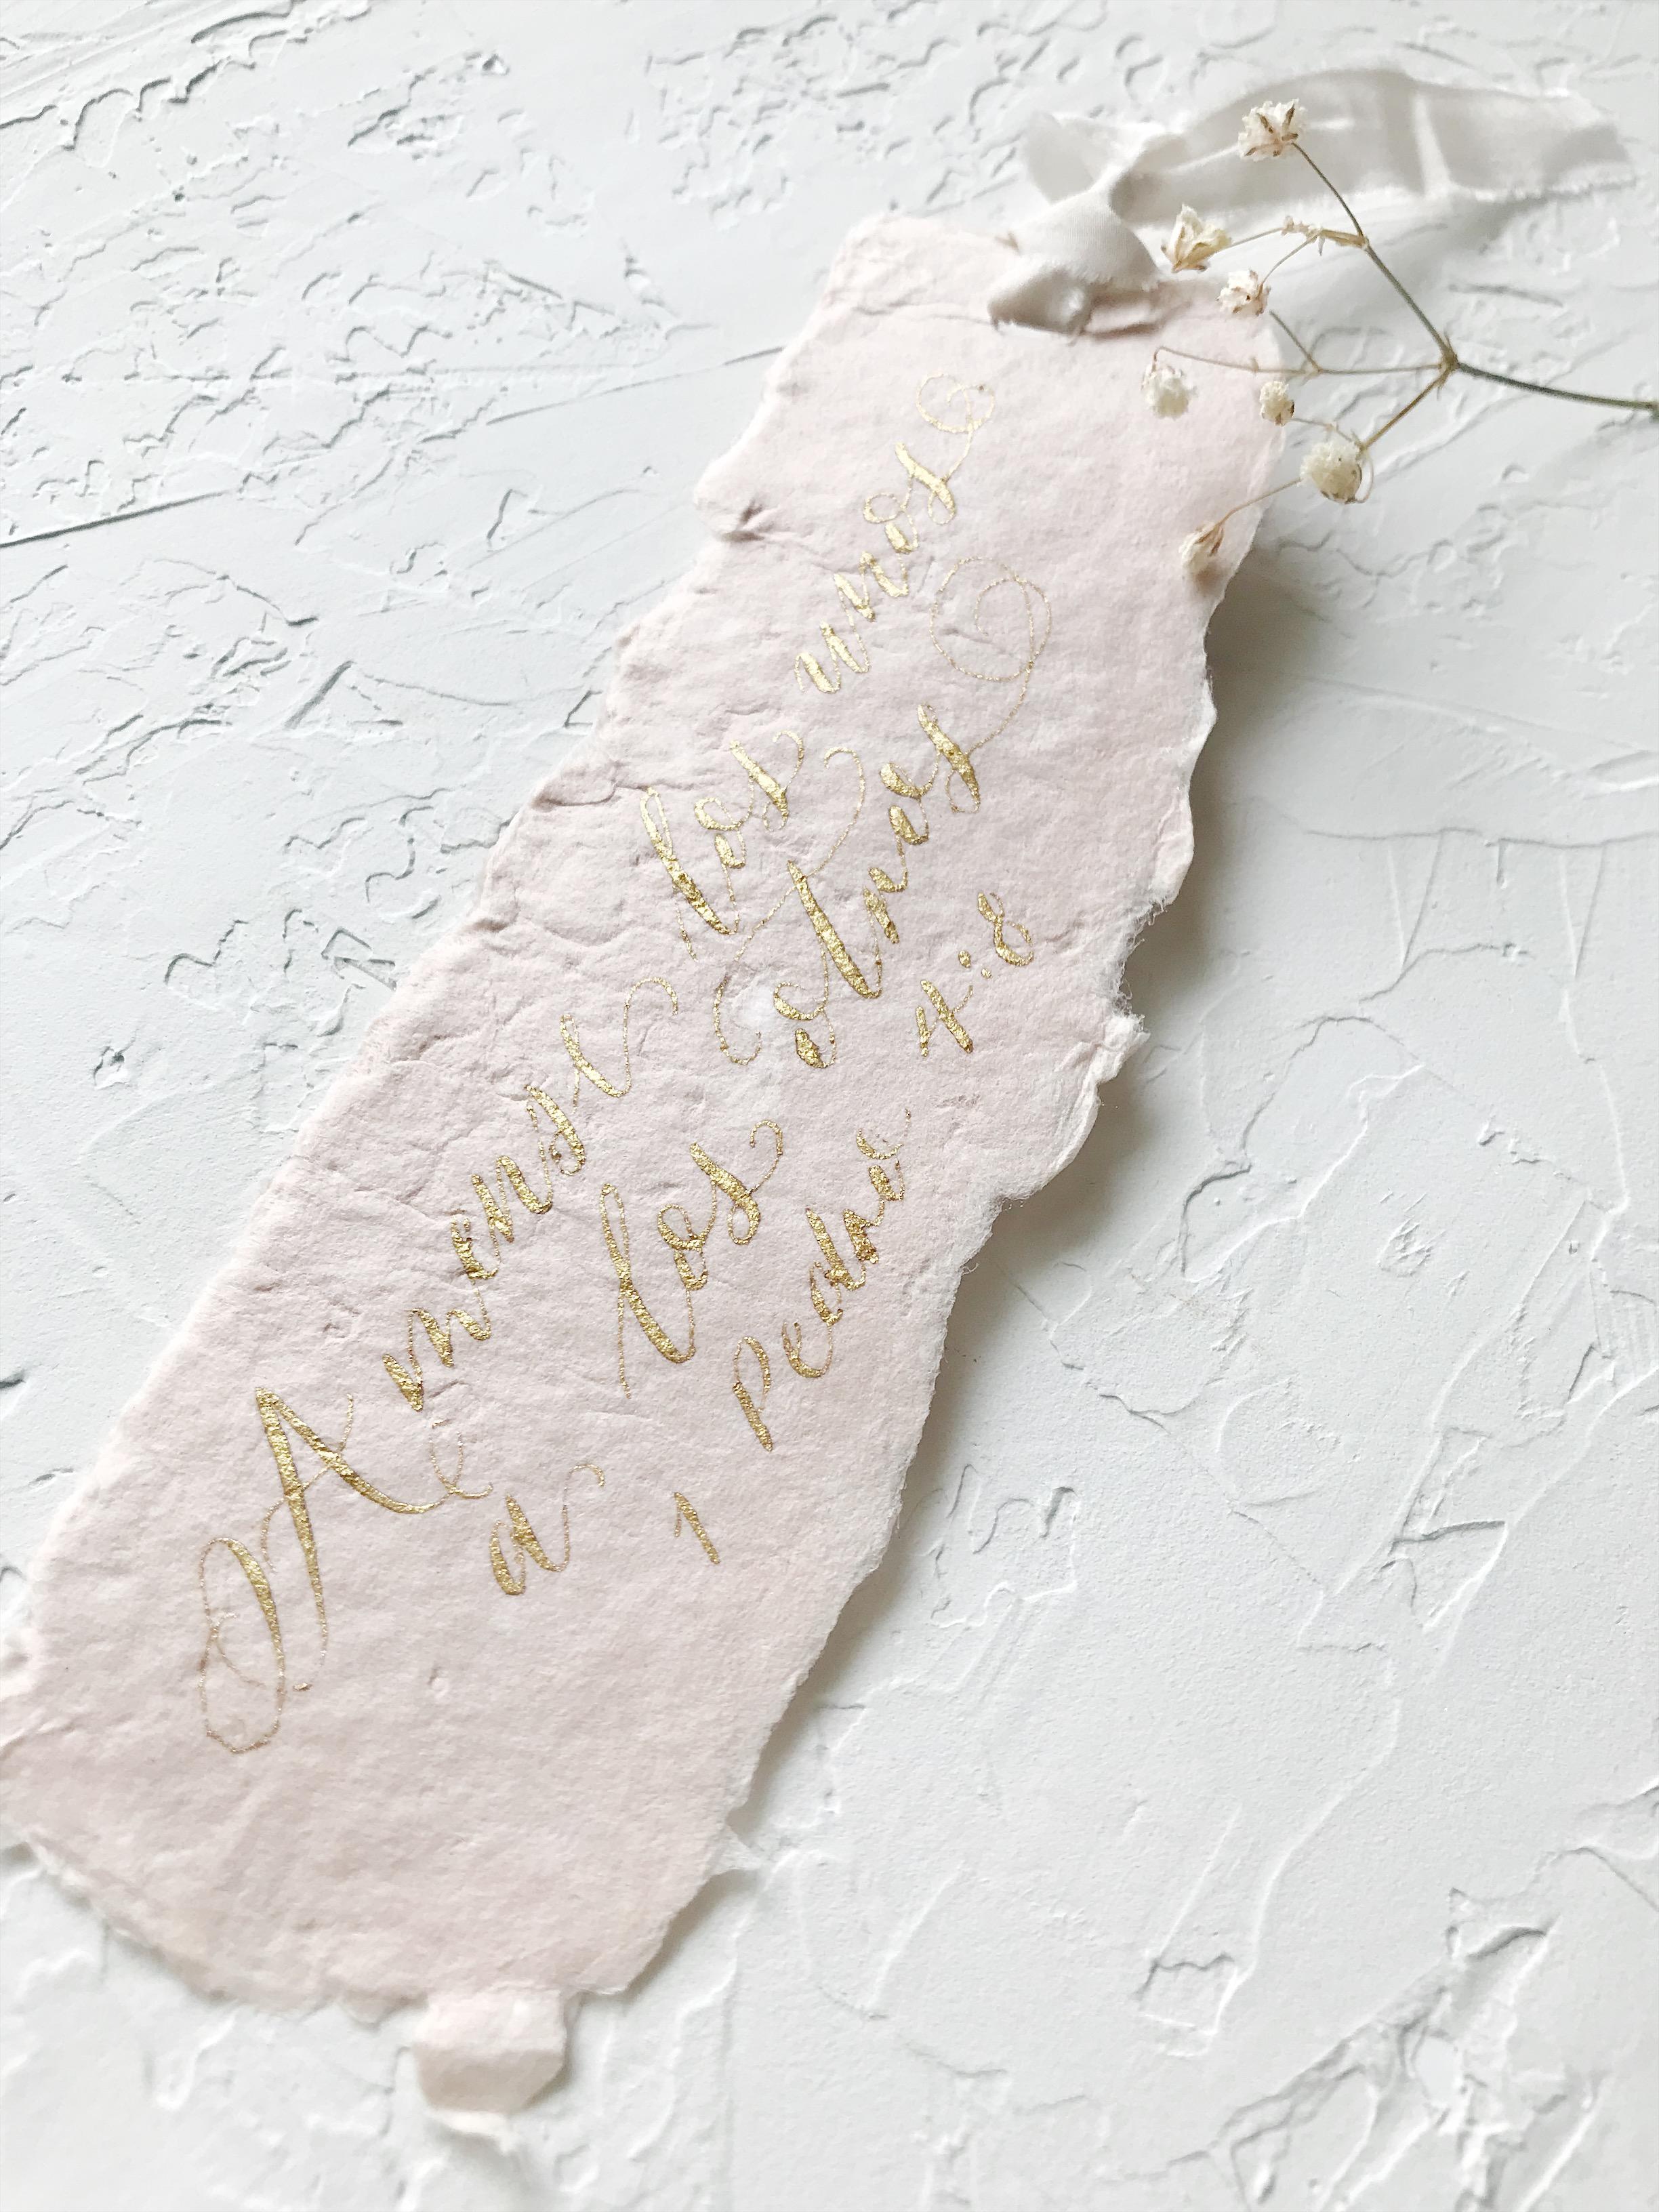 Heirloom Bookmark on handmade paper. Gold Ink and Hand died Silk Ribbon - Esperanza Atelier Fine Art Calligraphy